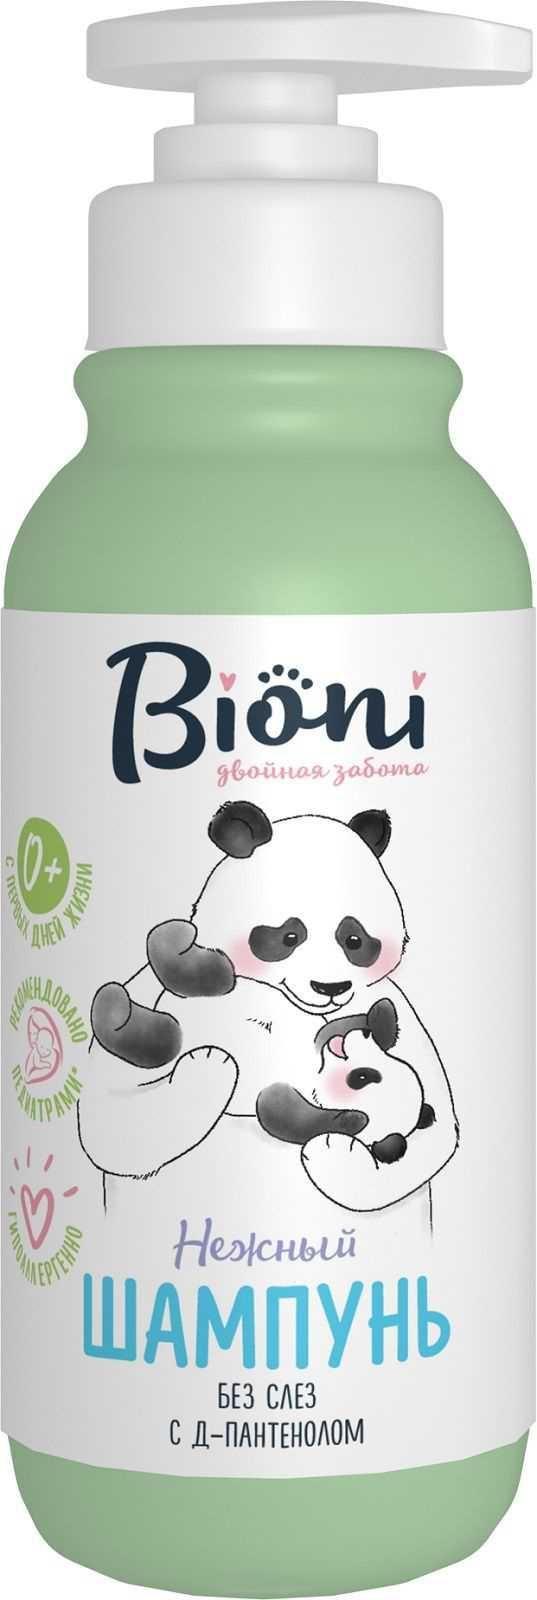 фото упаковки Bioni Детский шампунь Без слез